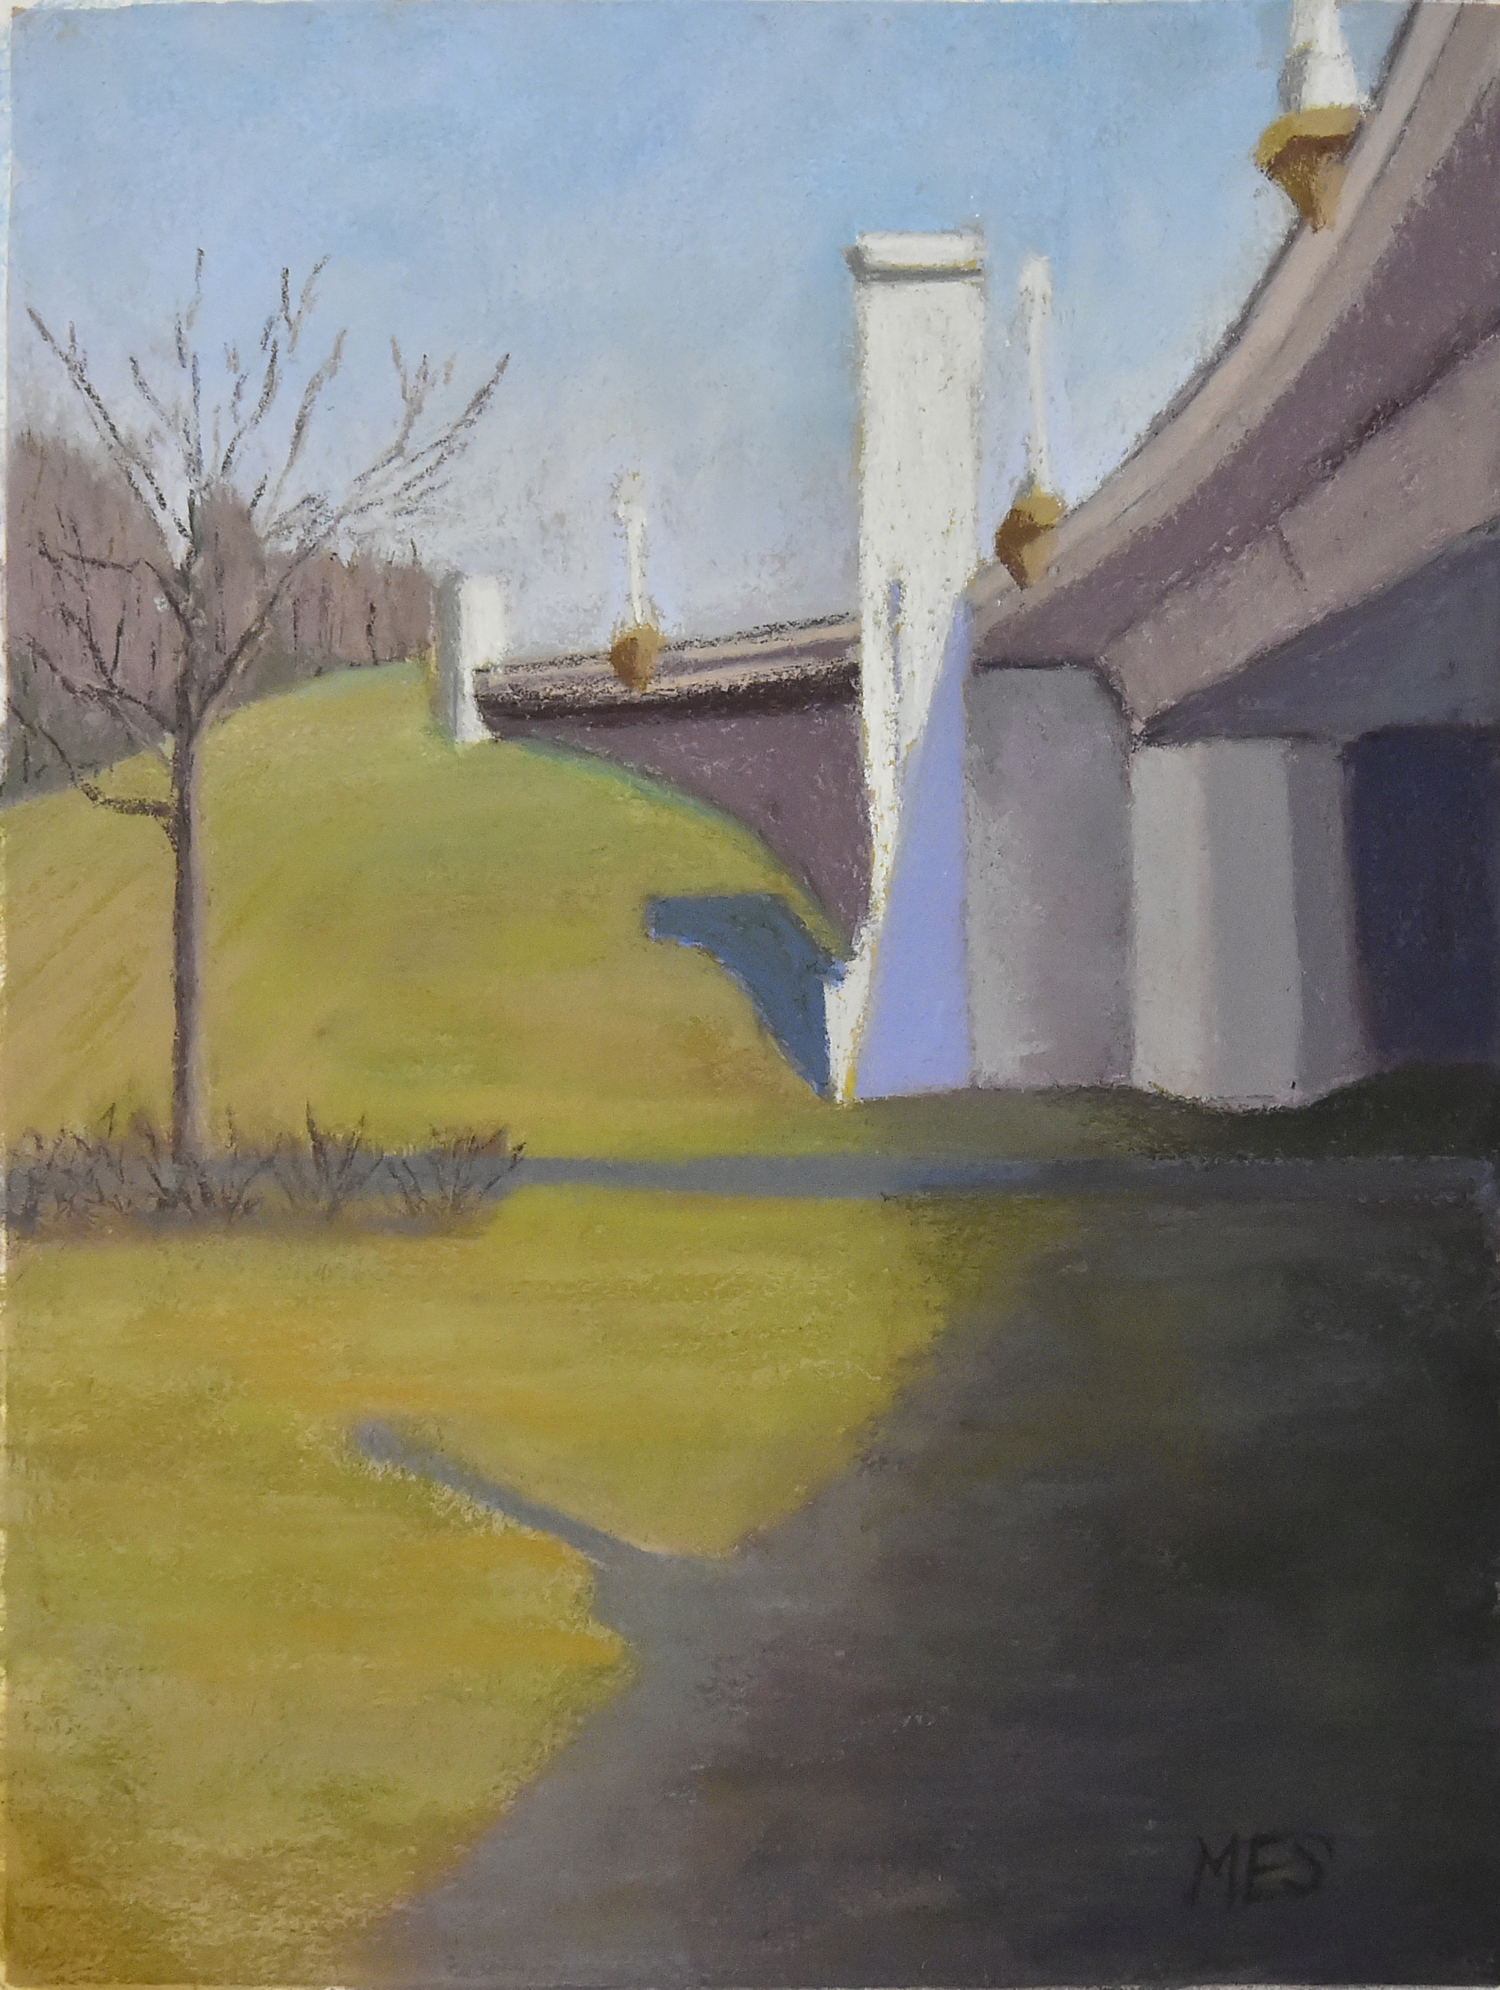 M.E. Simon, Under the Bridge, III